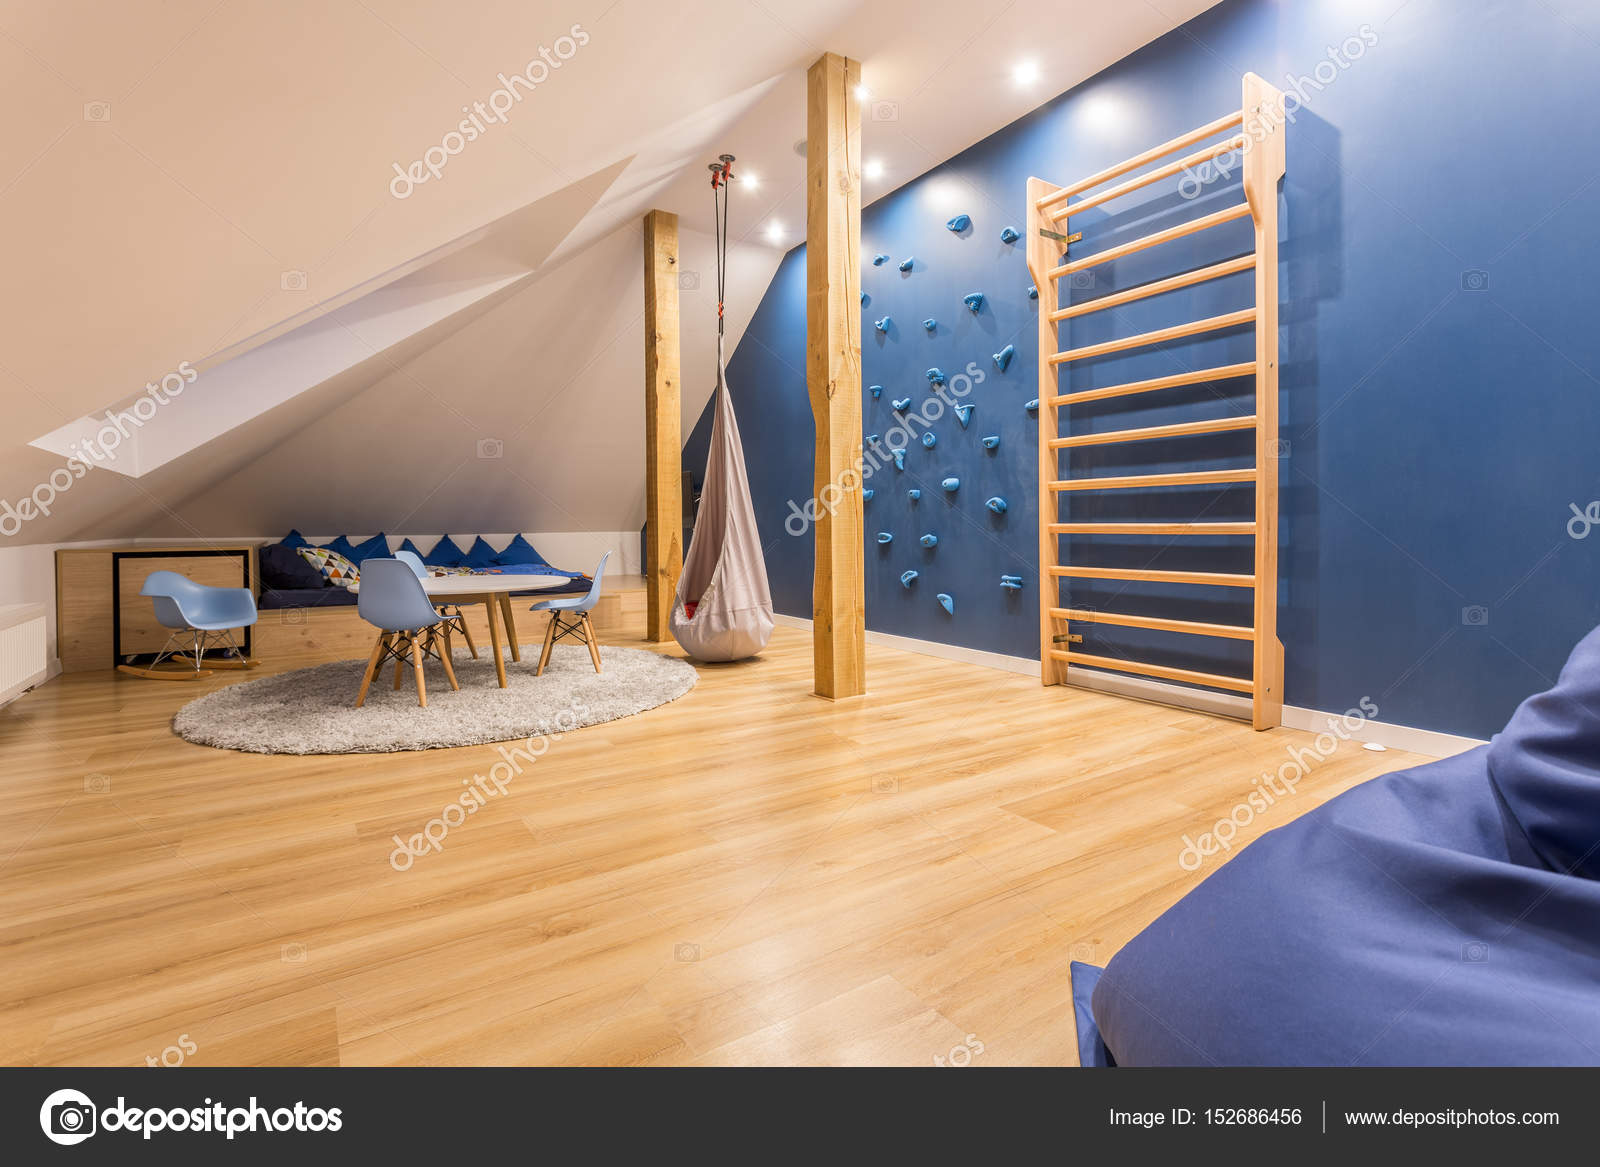 kinderzimmer mit kletterwand — stockfoto © photographee.eu #152686456